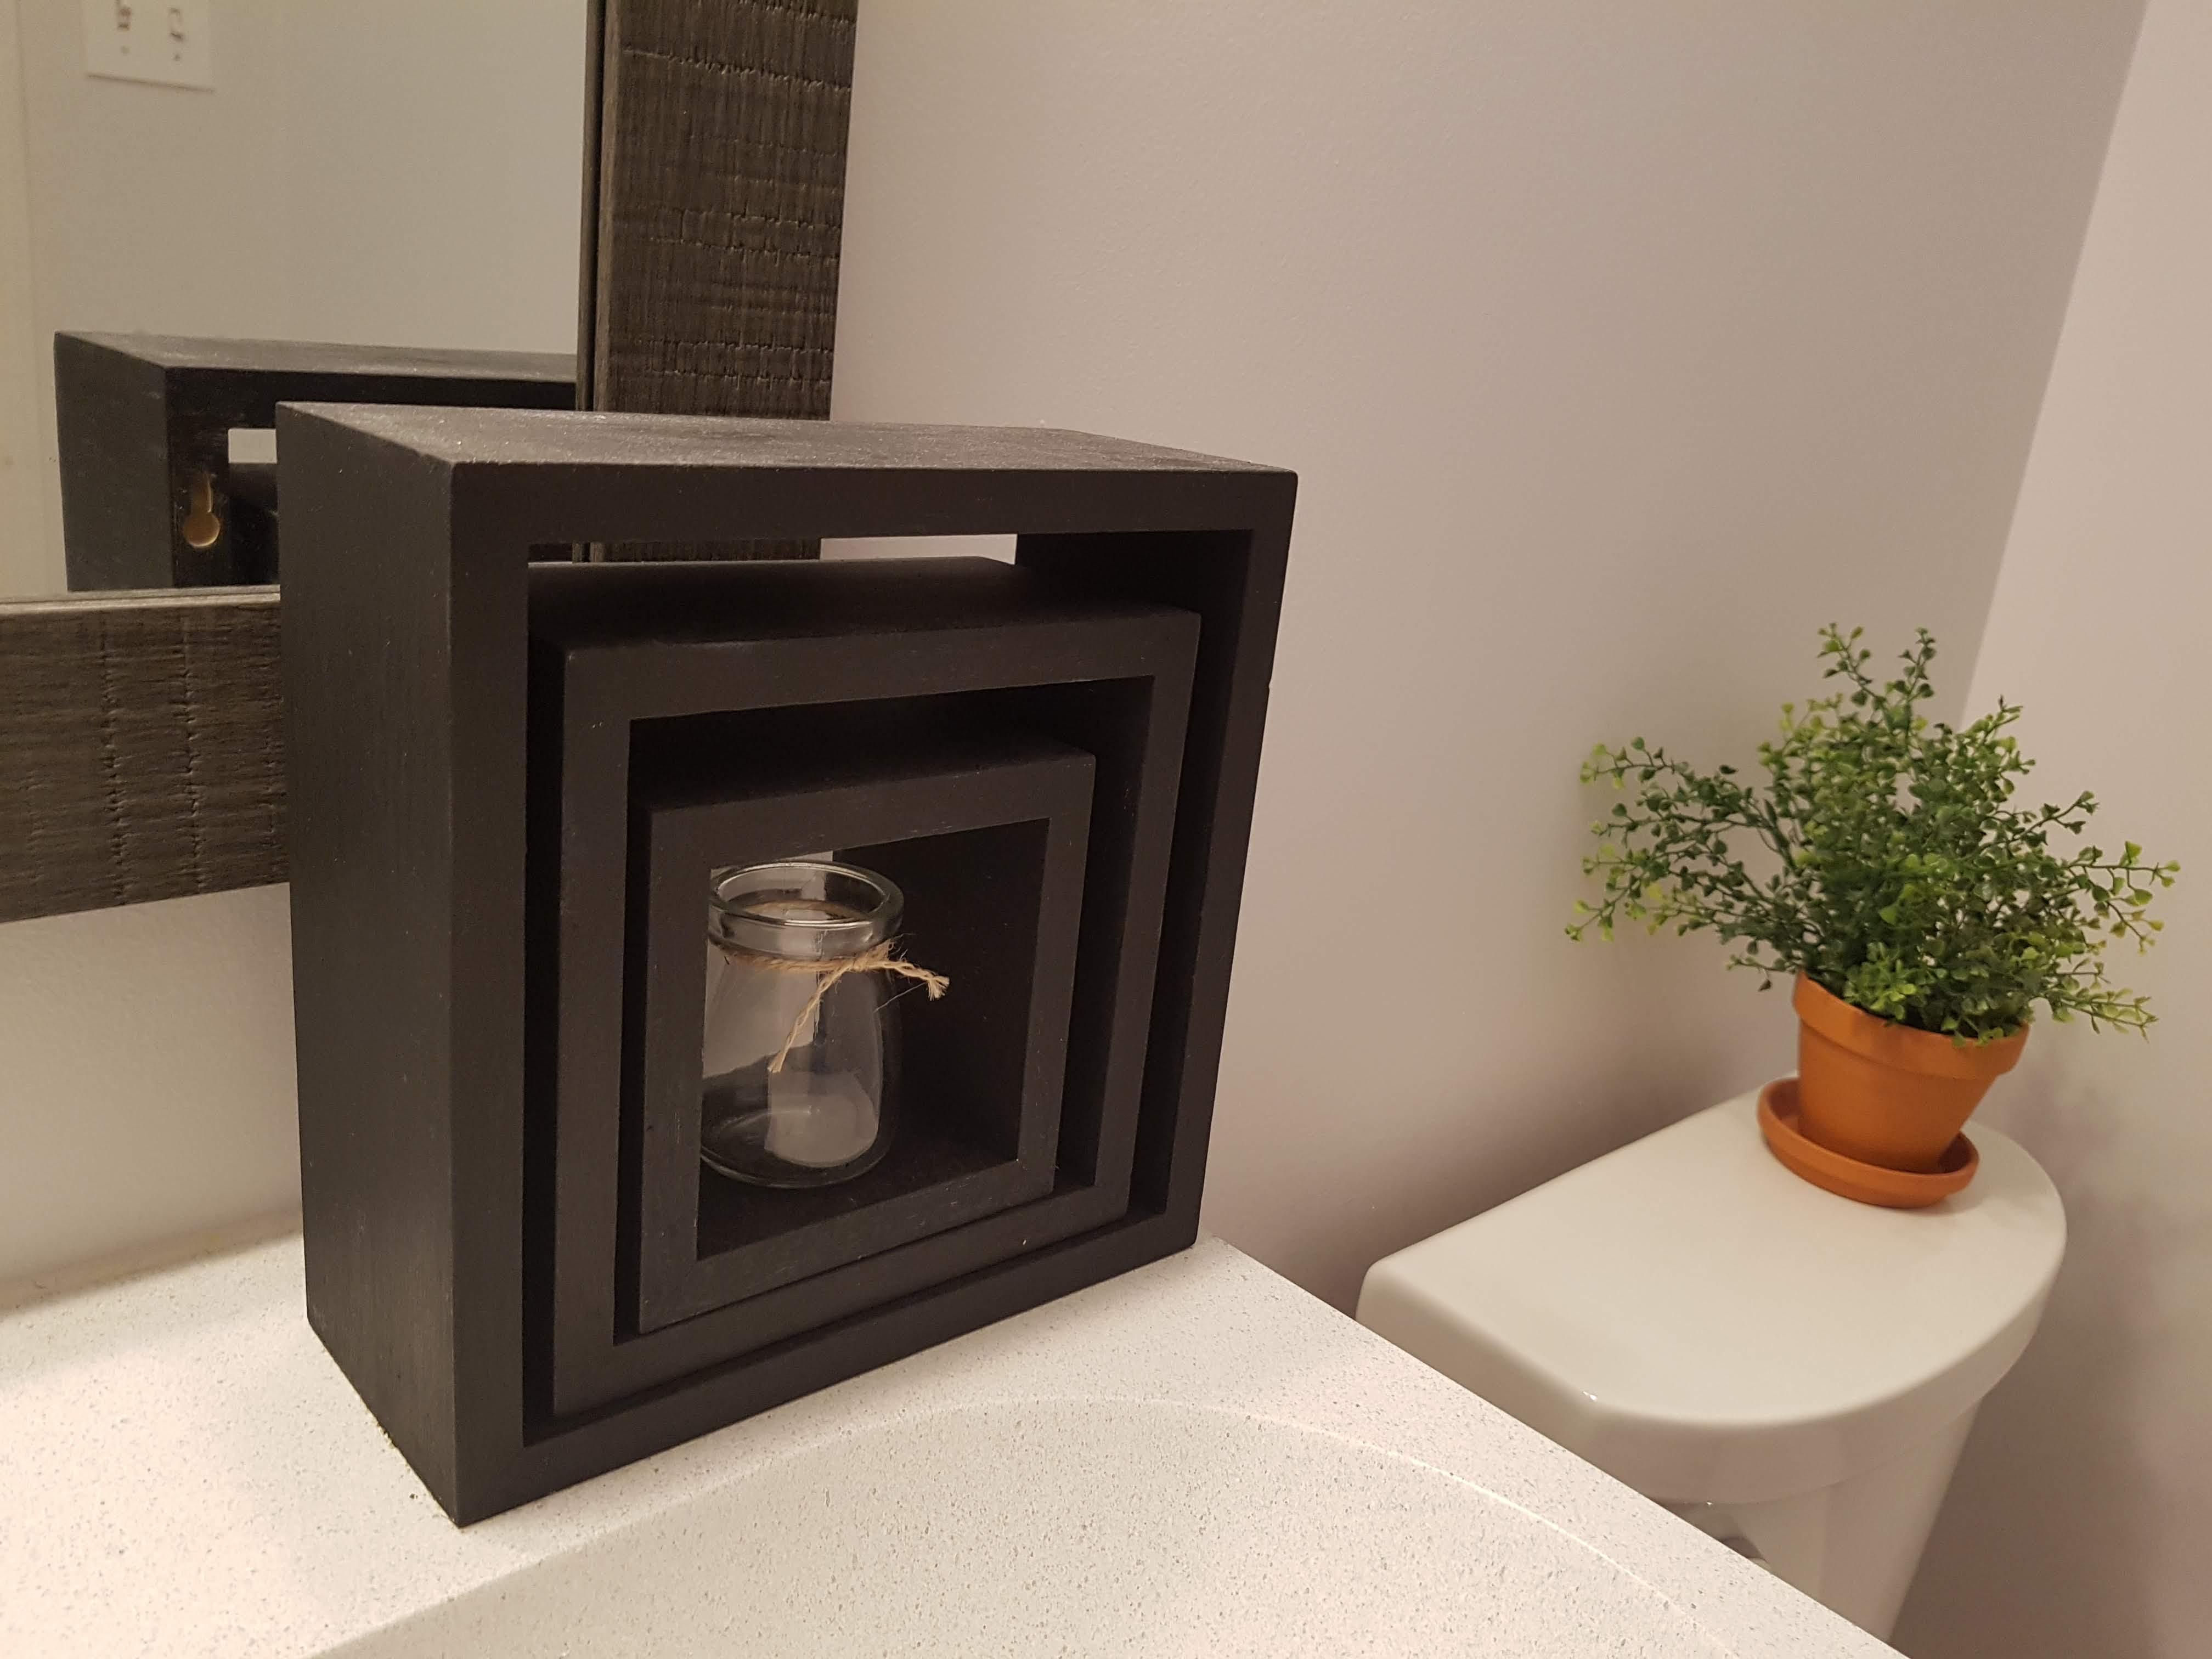 DIY Home Decor Cube Shelves